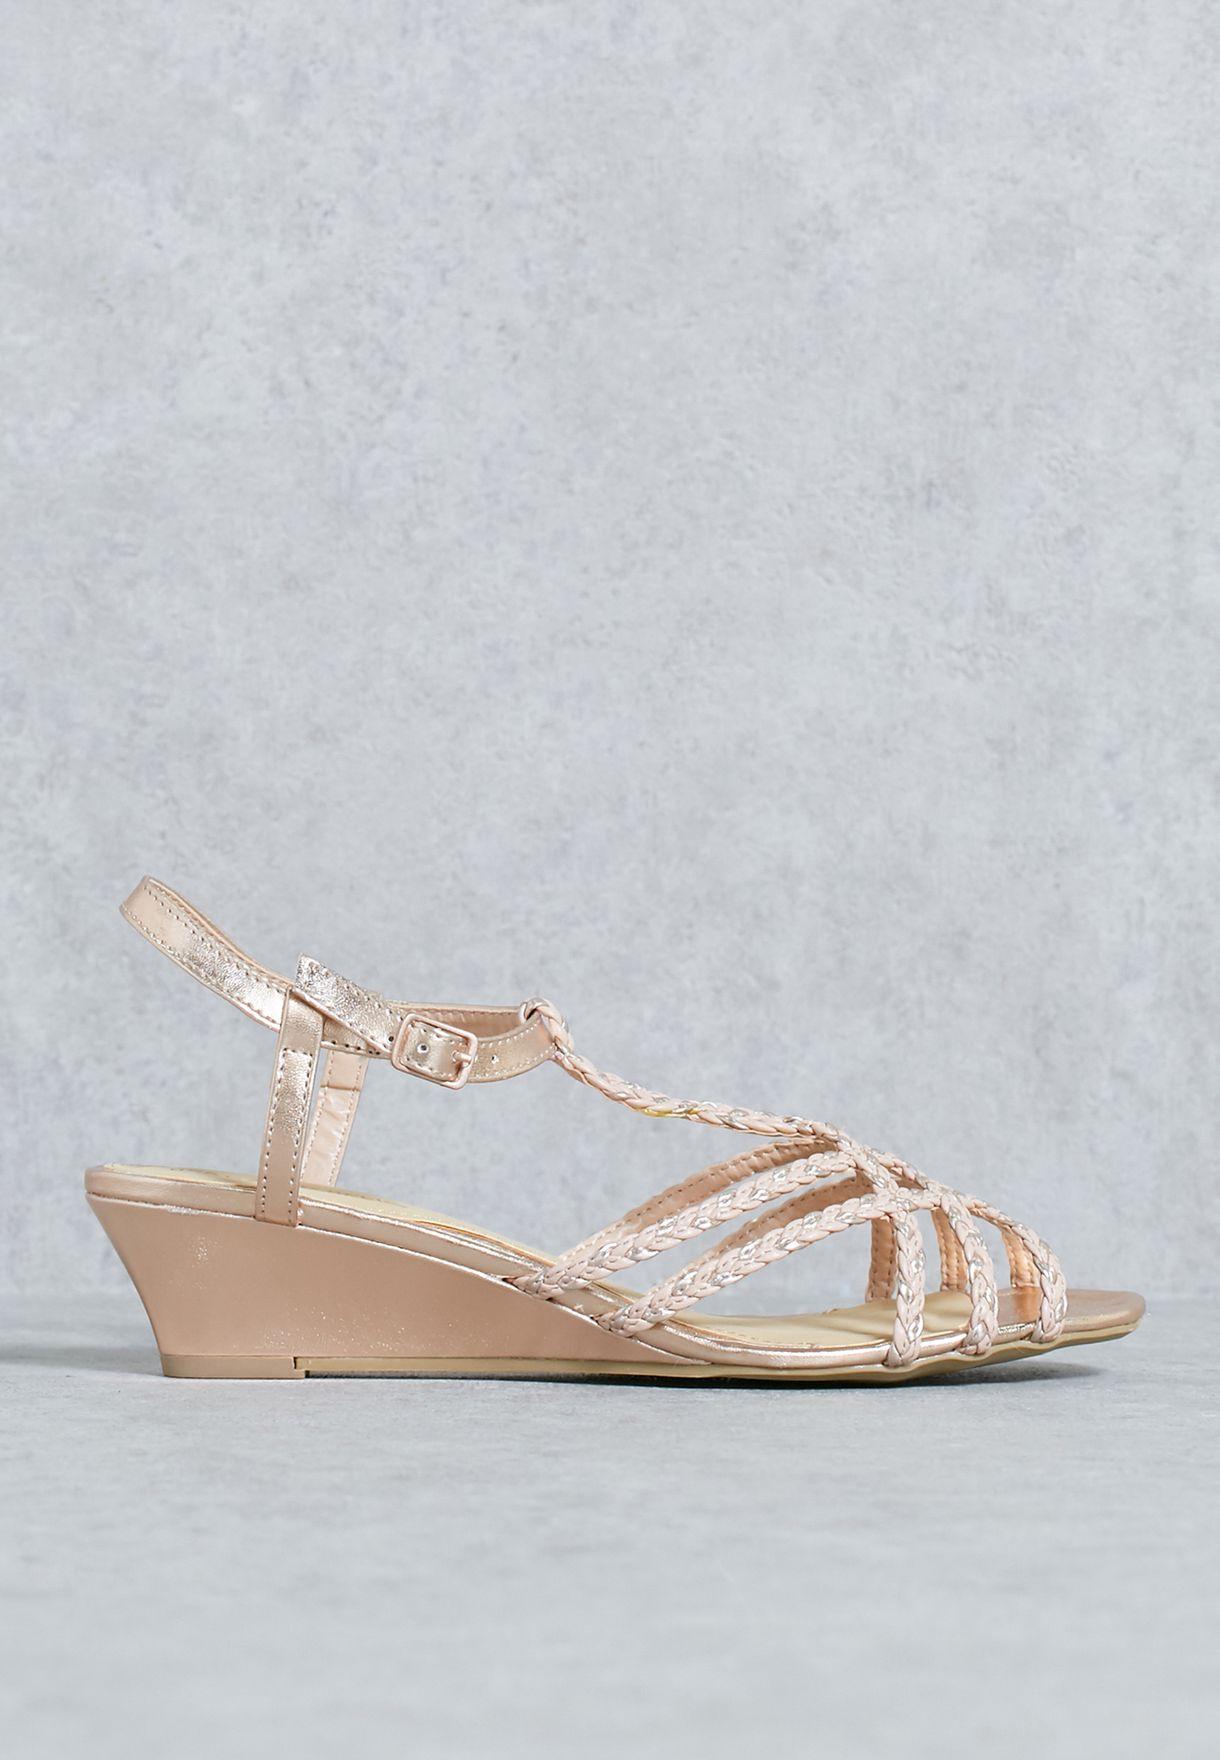 5724dd64672 Shop Dune Head Over Heels pink Blush Braided Wedge Sandals ...